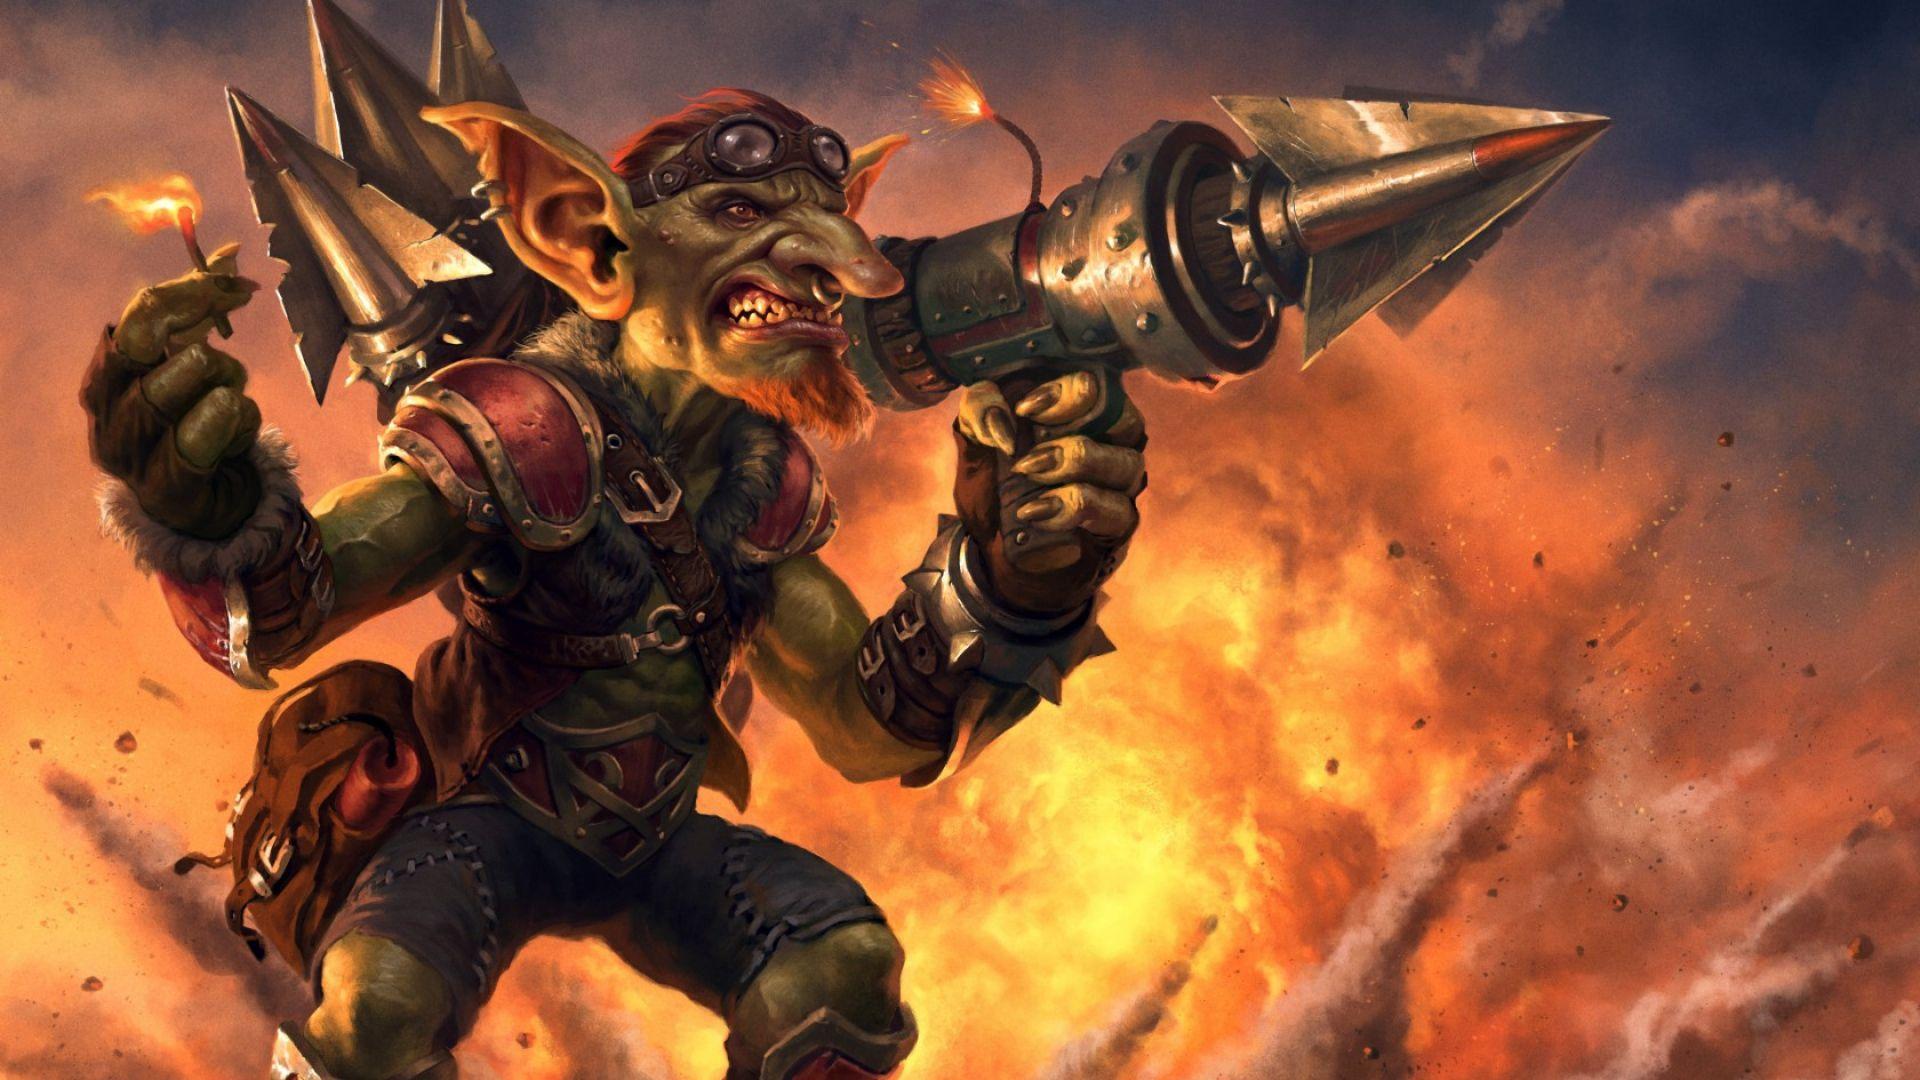 Hearthstone Goblins Vs Gnomes Goblin Hearthstone Heroes Of Warcraft Warcraf